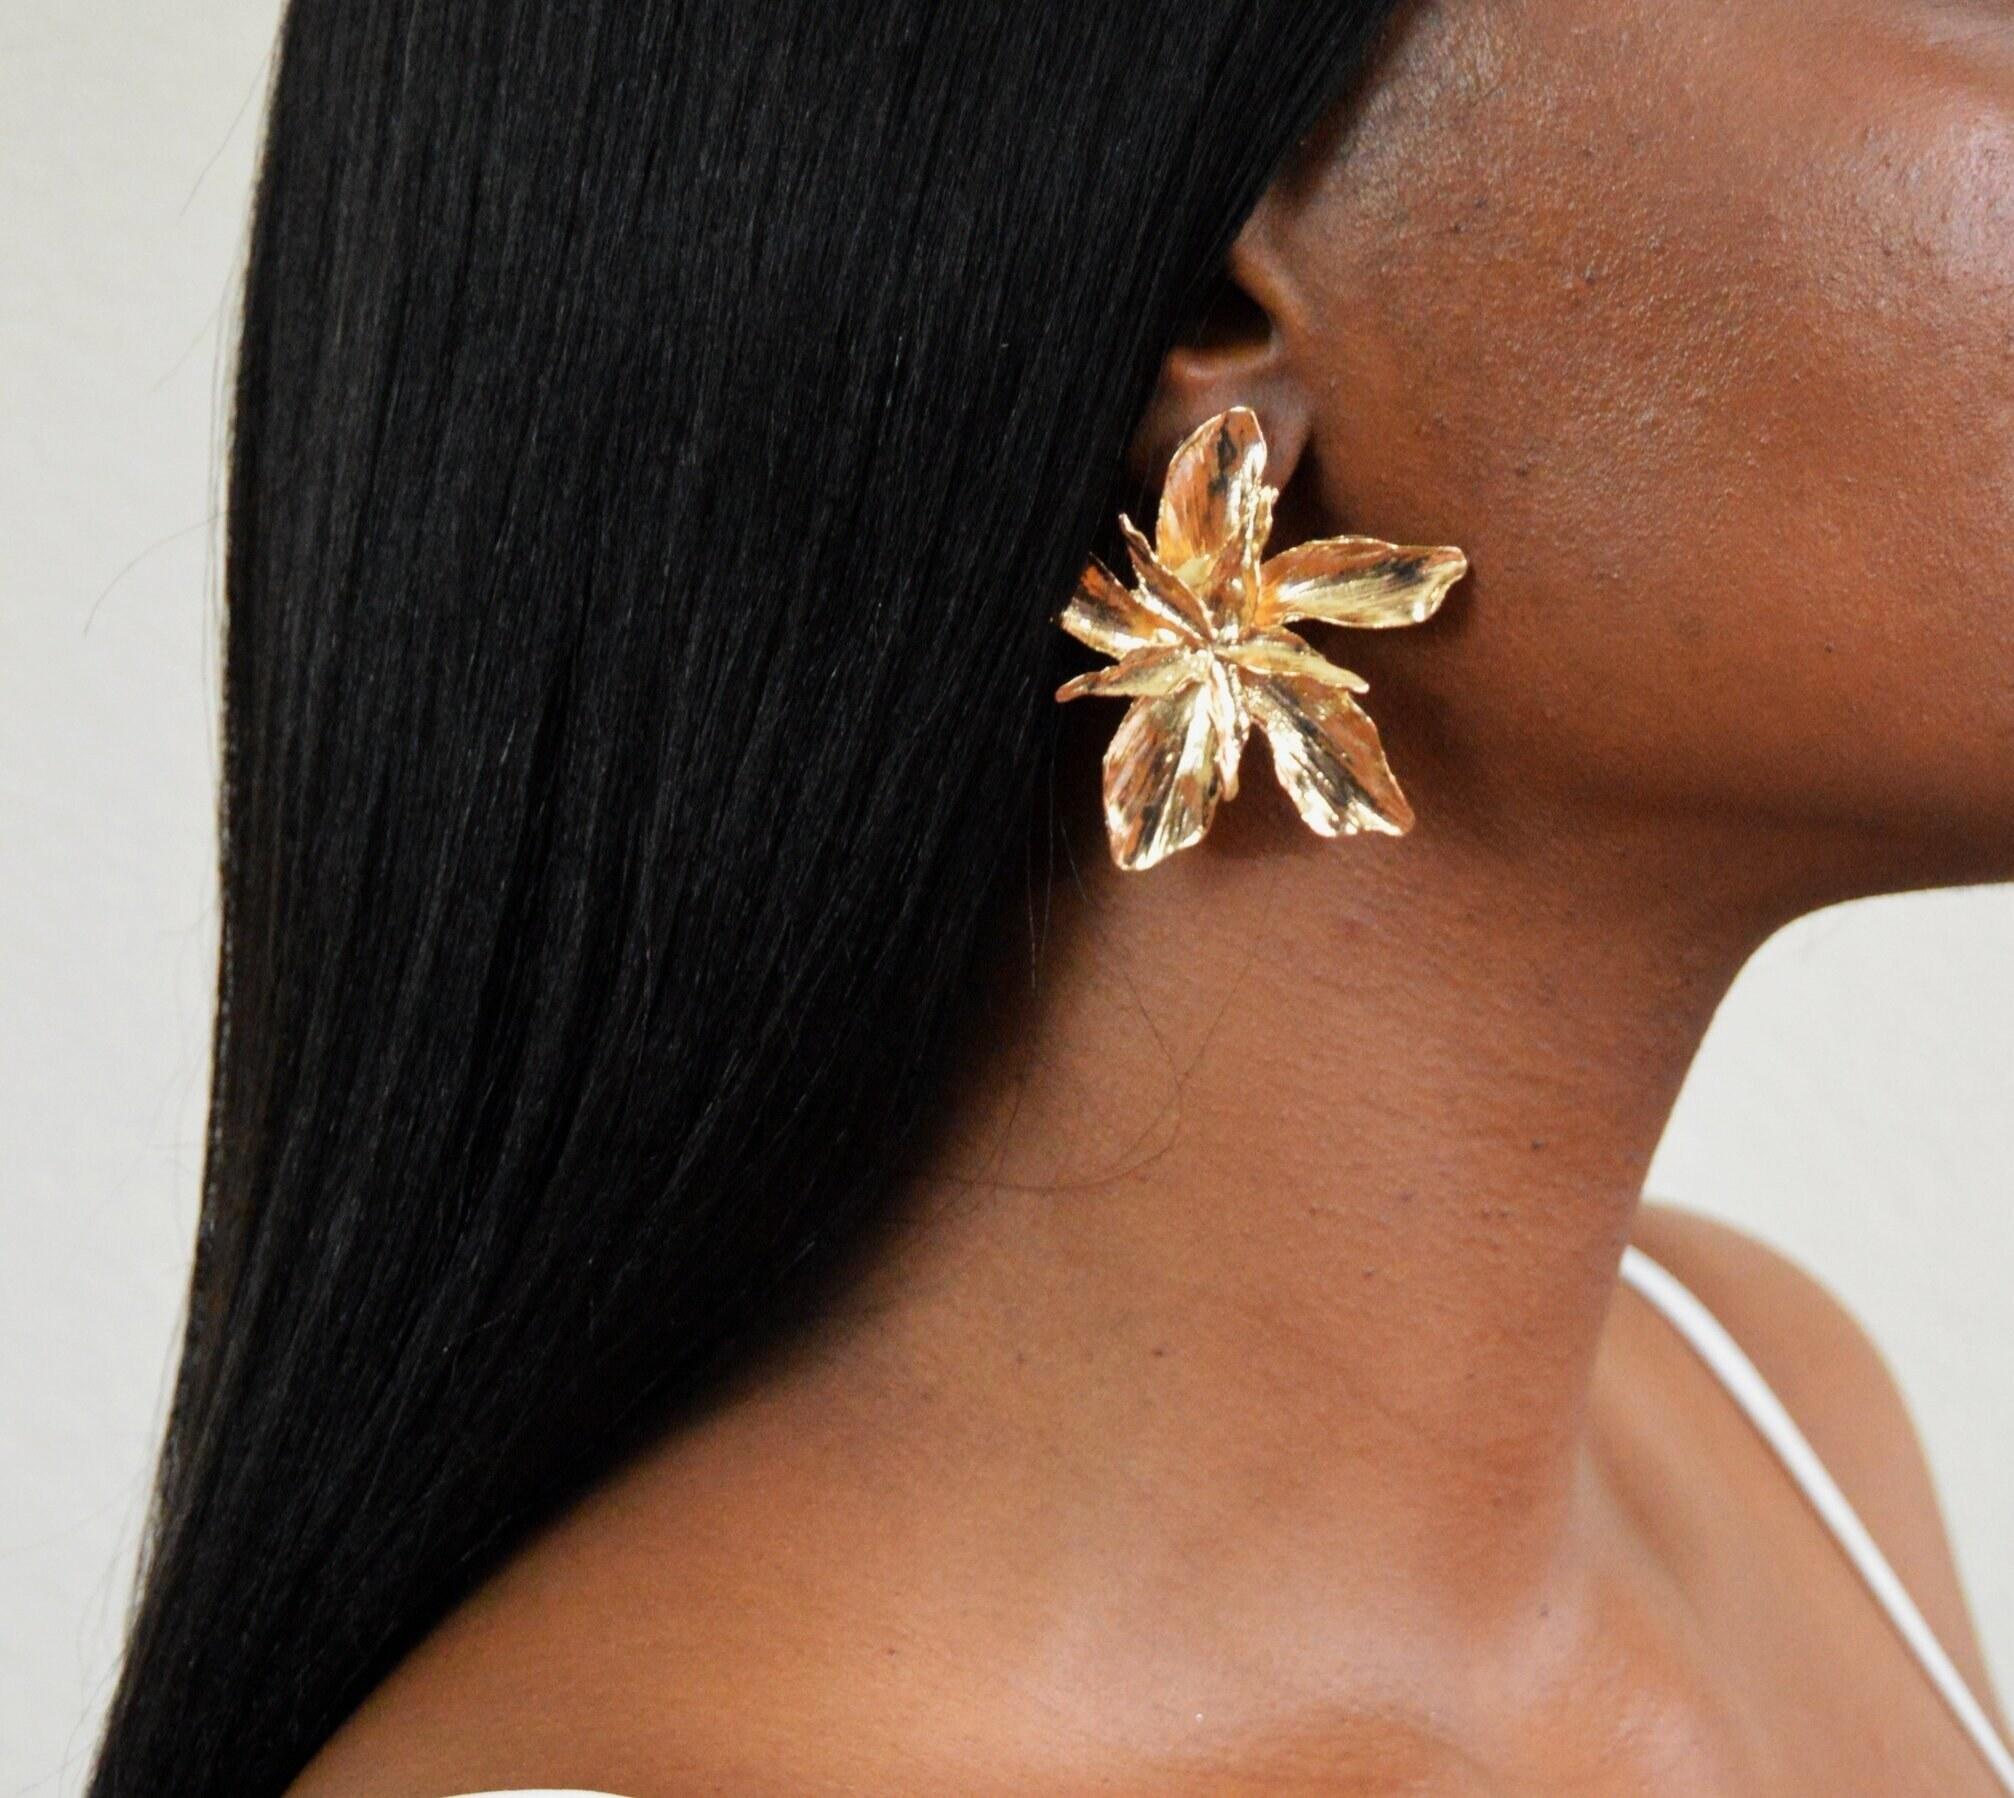 The large gold flower earring on a model's ear